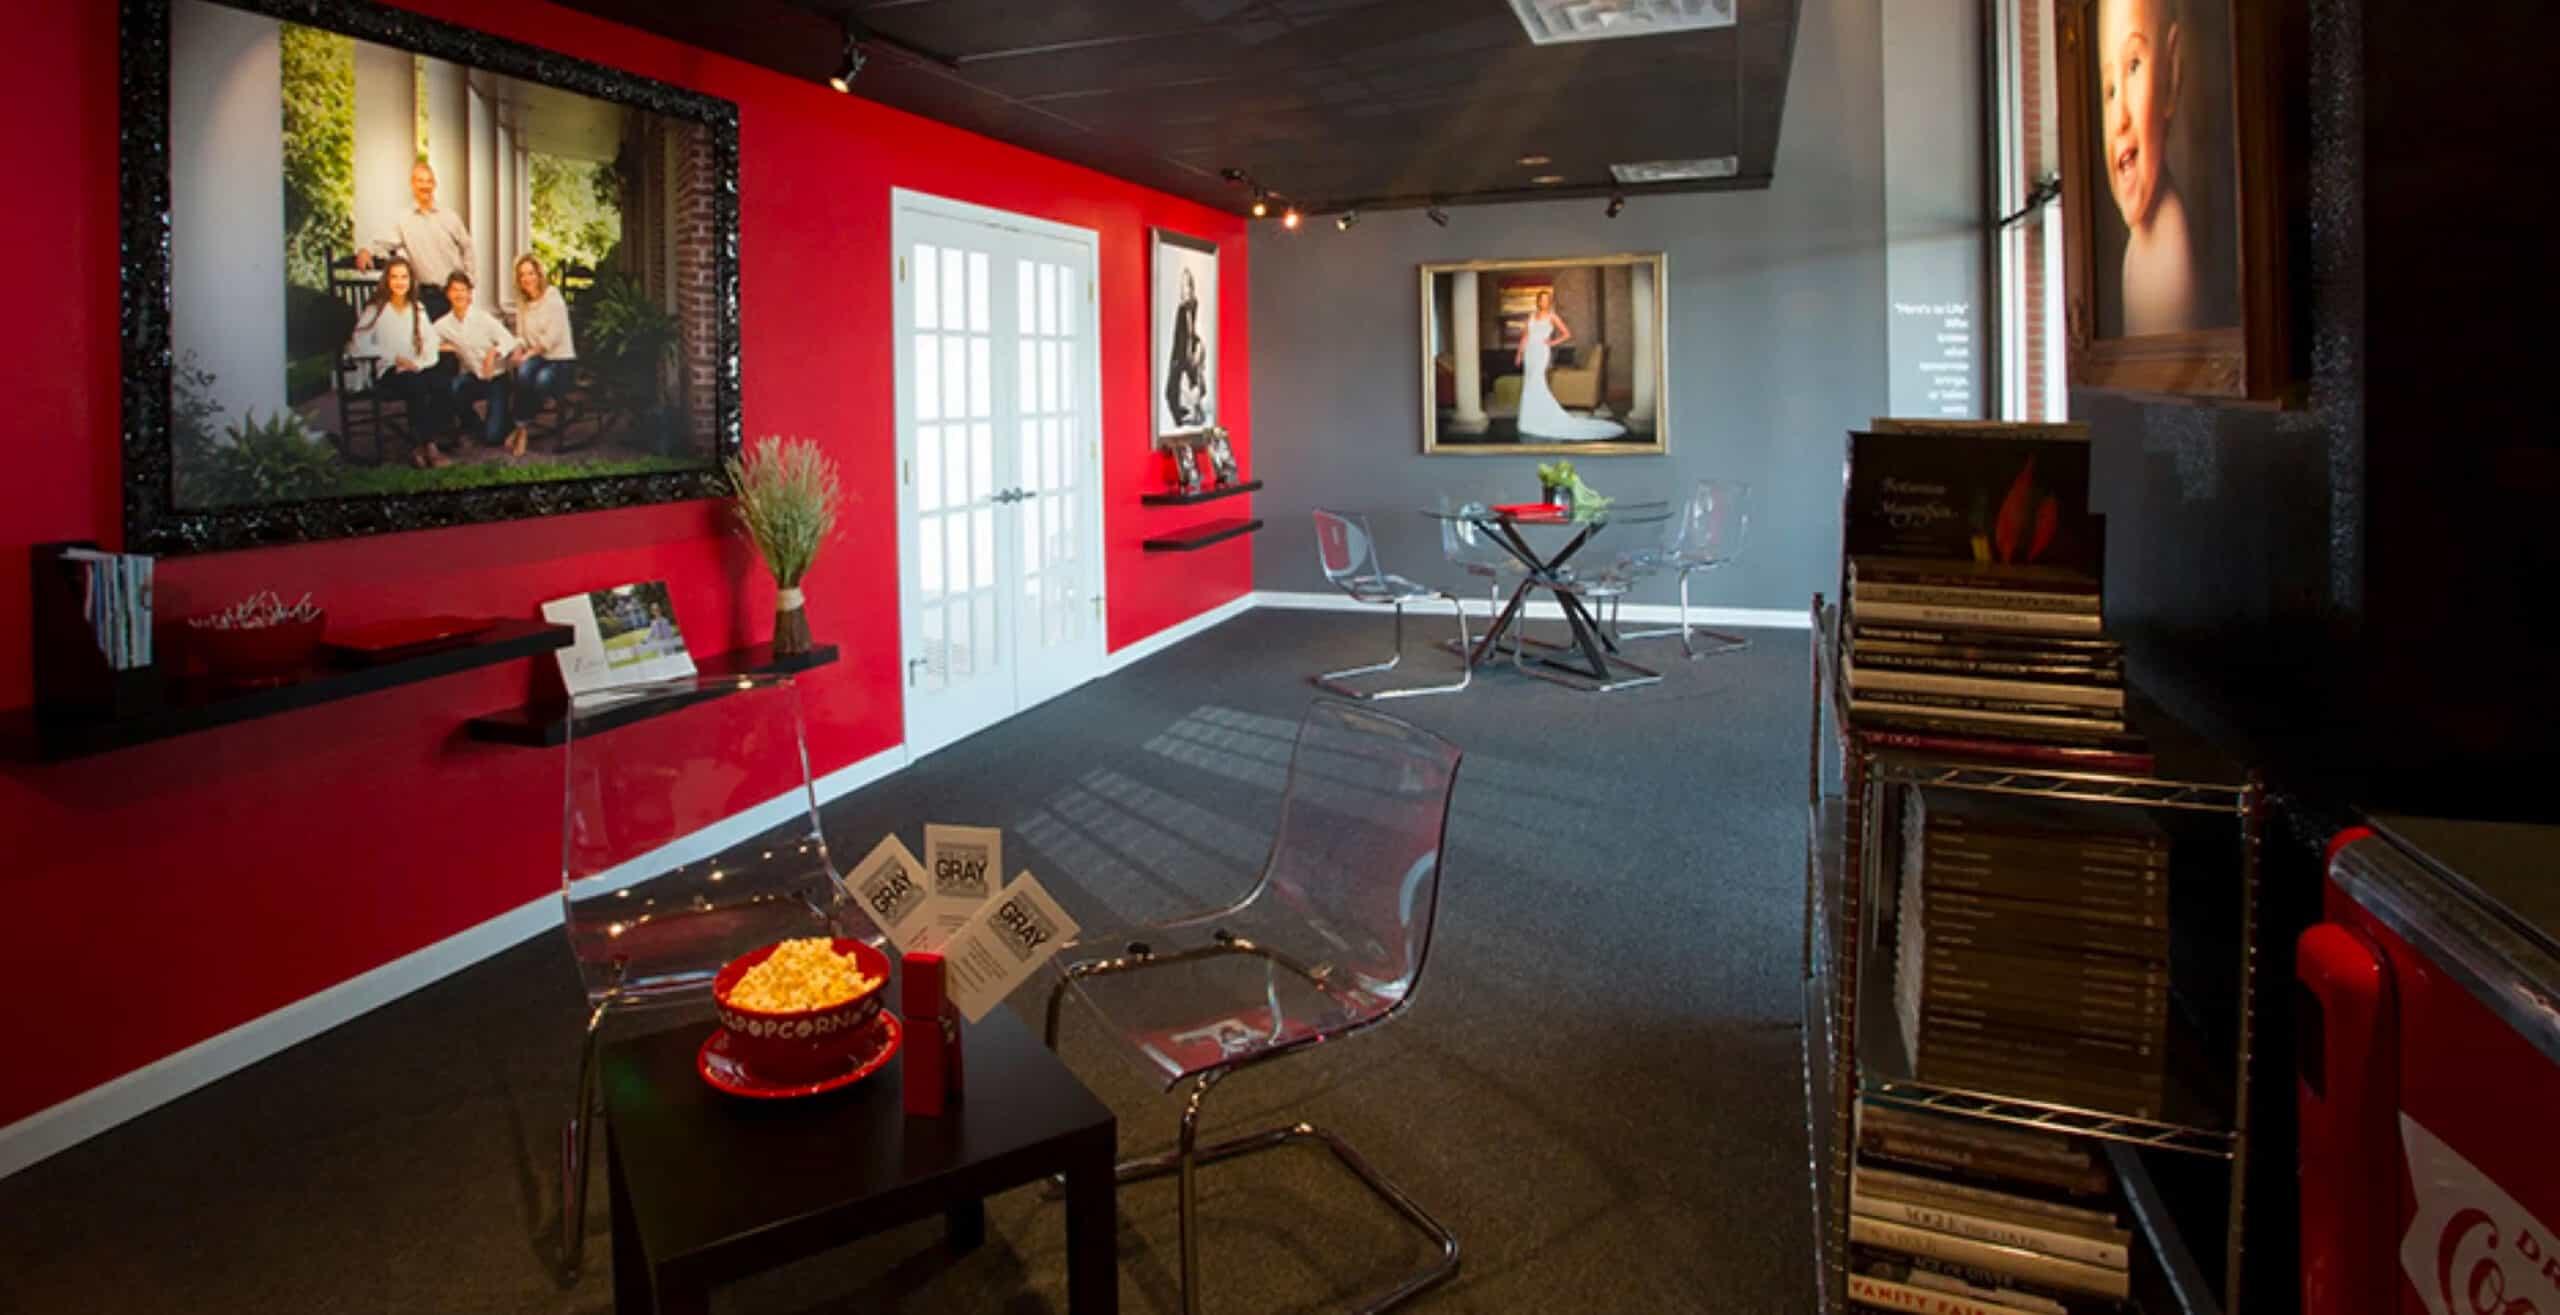 Wess Gray studio reception area